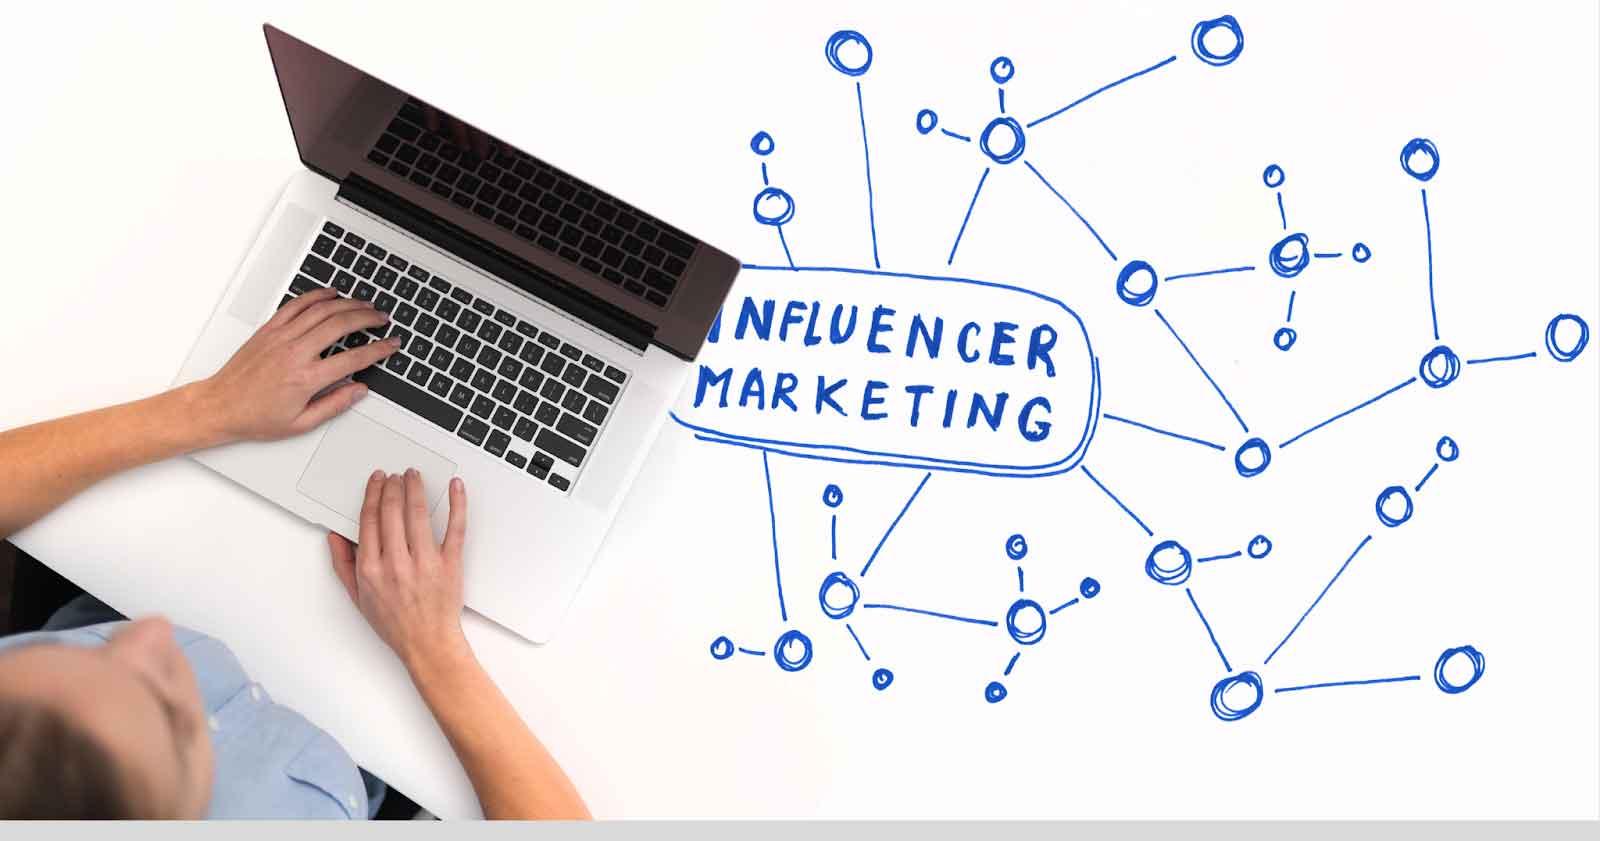 UGC and influencer Marketing